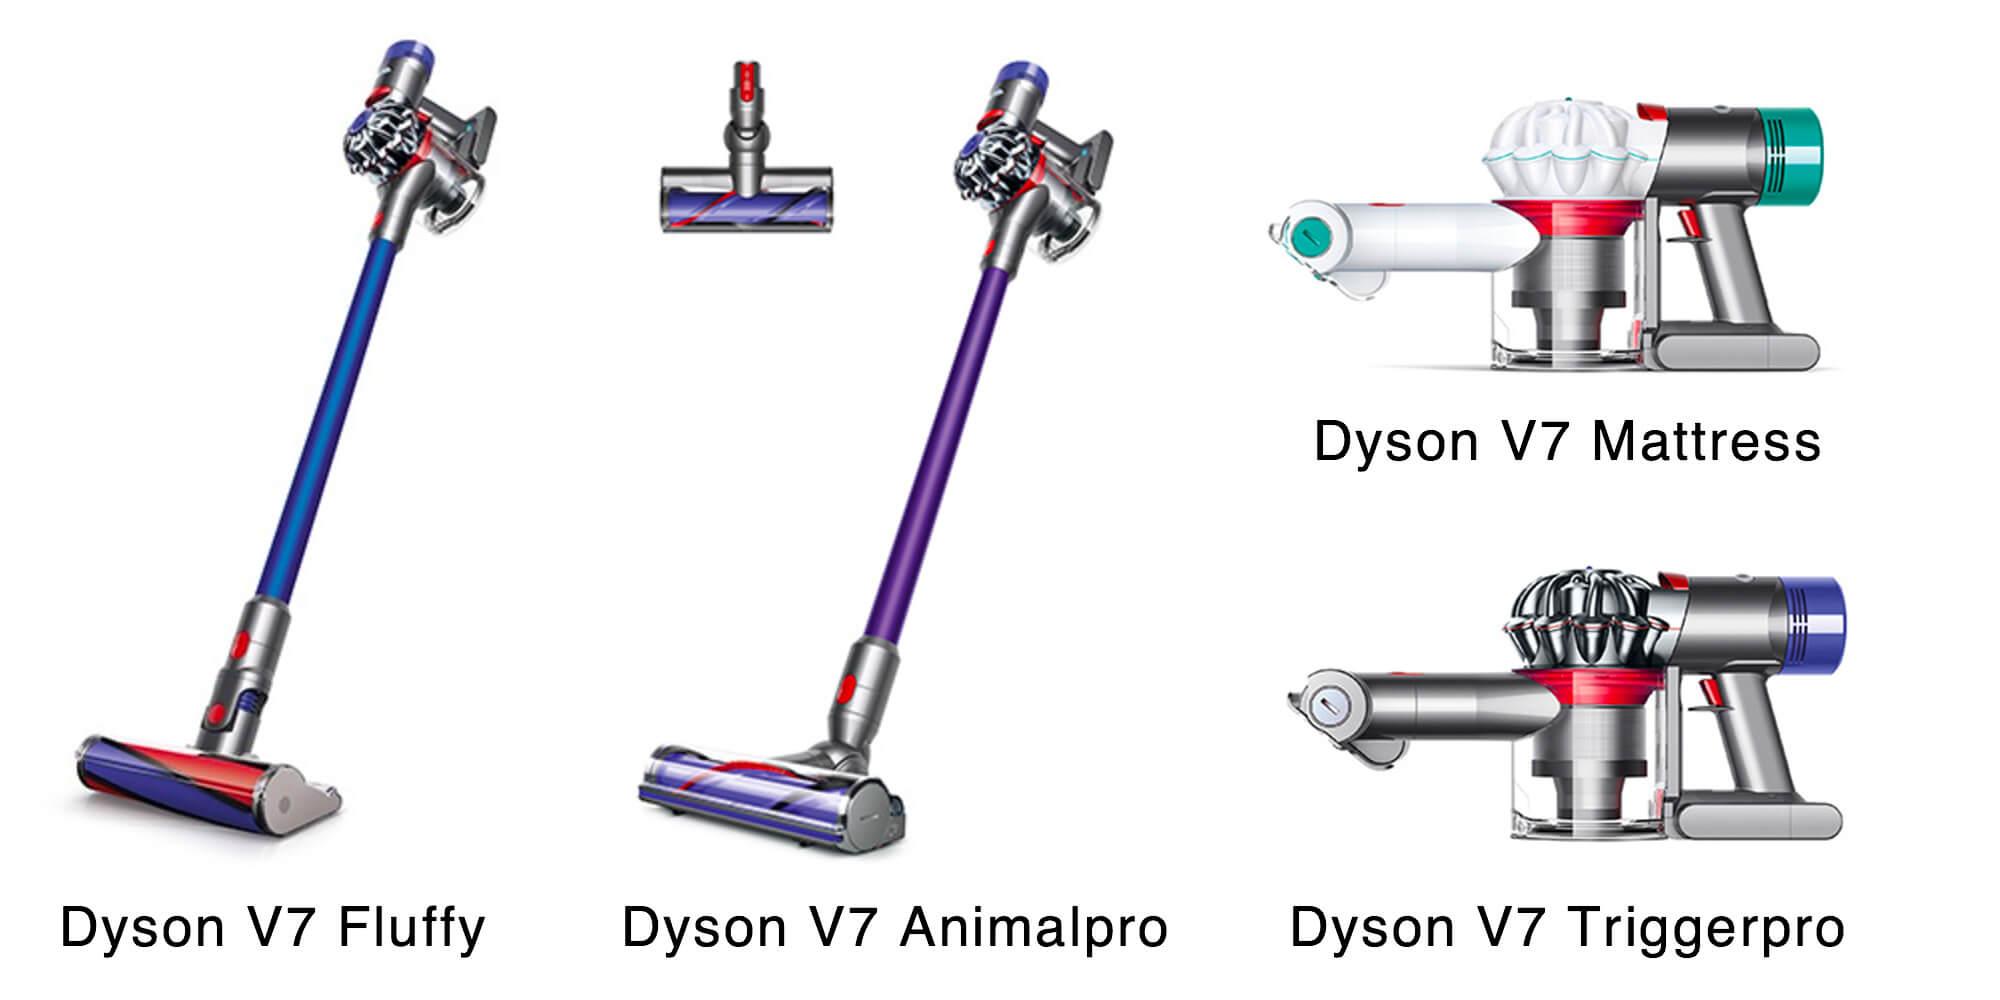 Dysonコードレス掃除機 V7シリーズを徹底解説!旧V8、V6シリーズとの違いを検証します